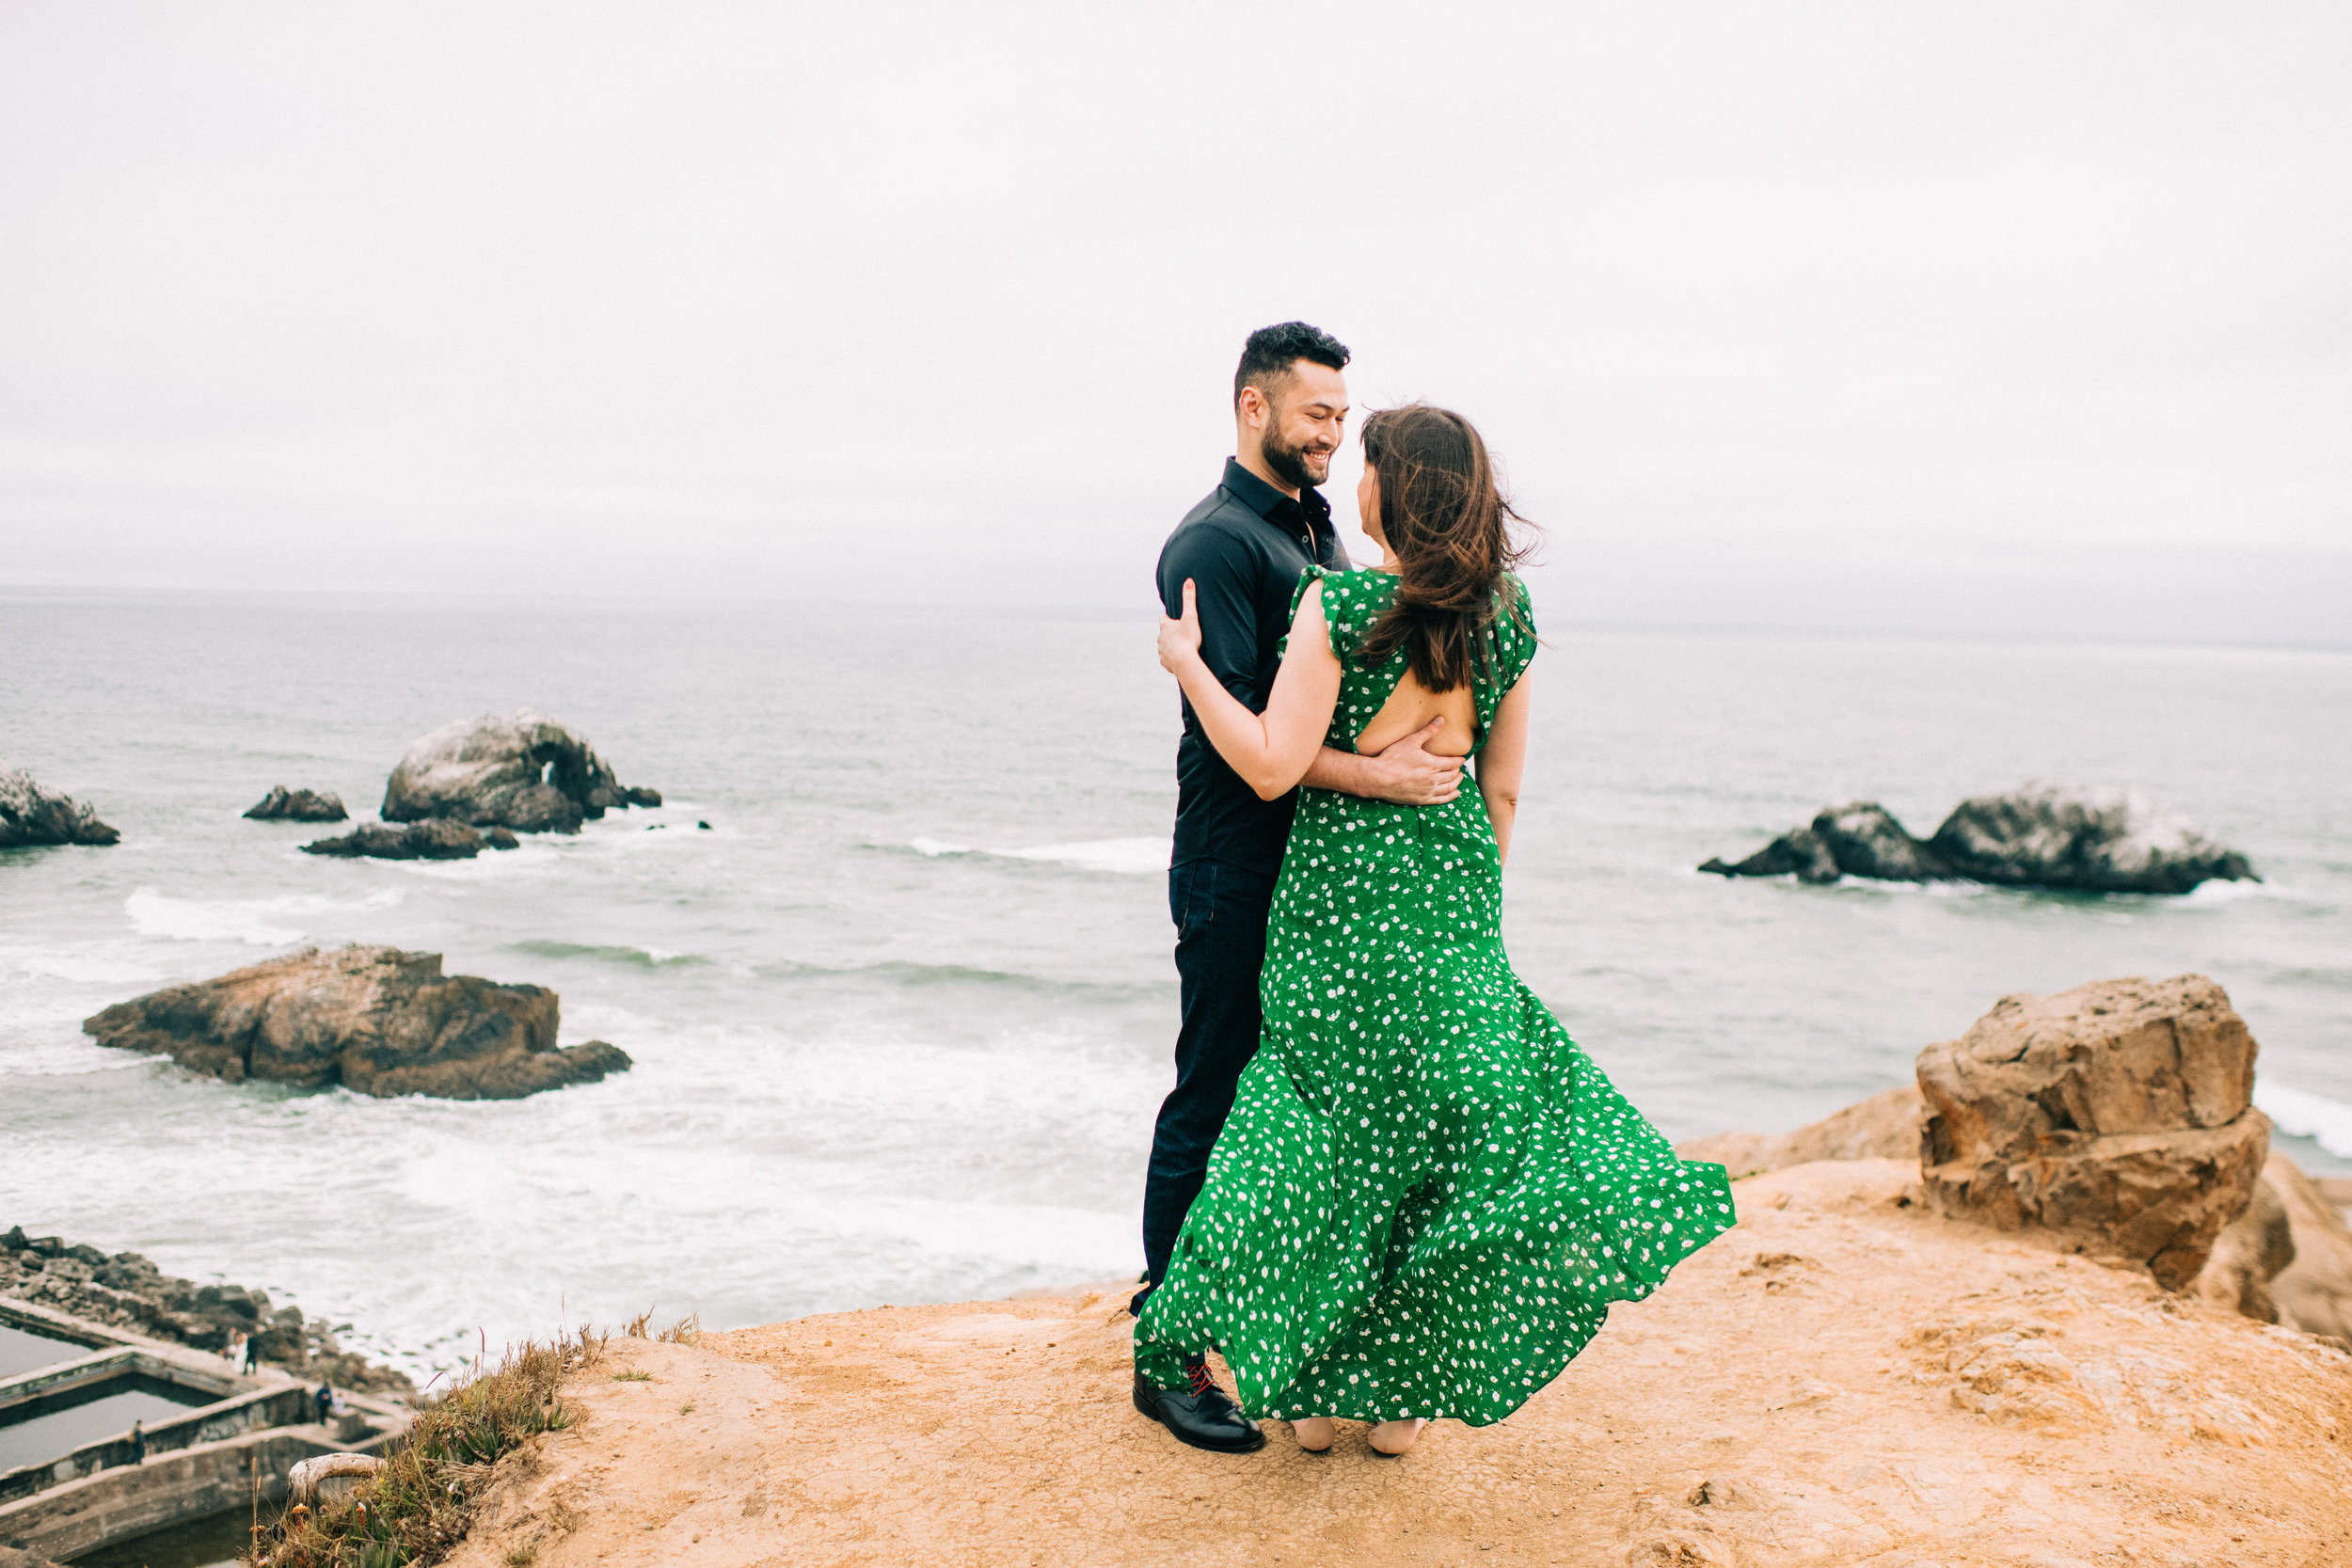 bay area lands end sutro baths oakland san francisco engagement wedding nontraditional fun creative eclectic photographer magic-118.jpg